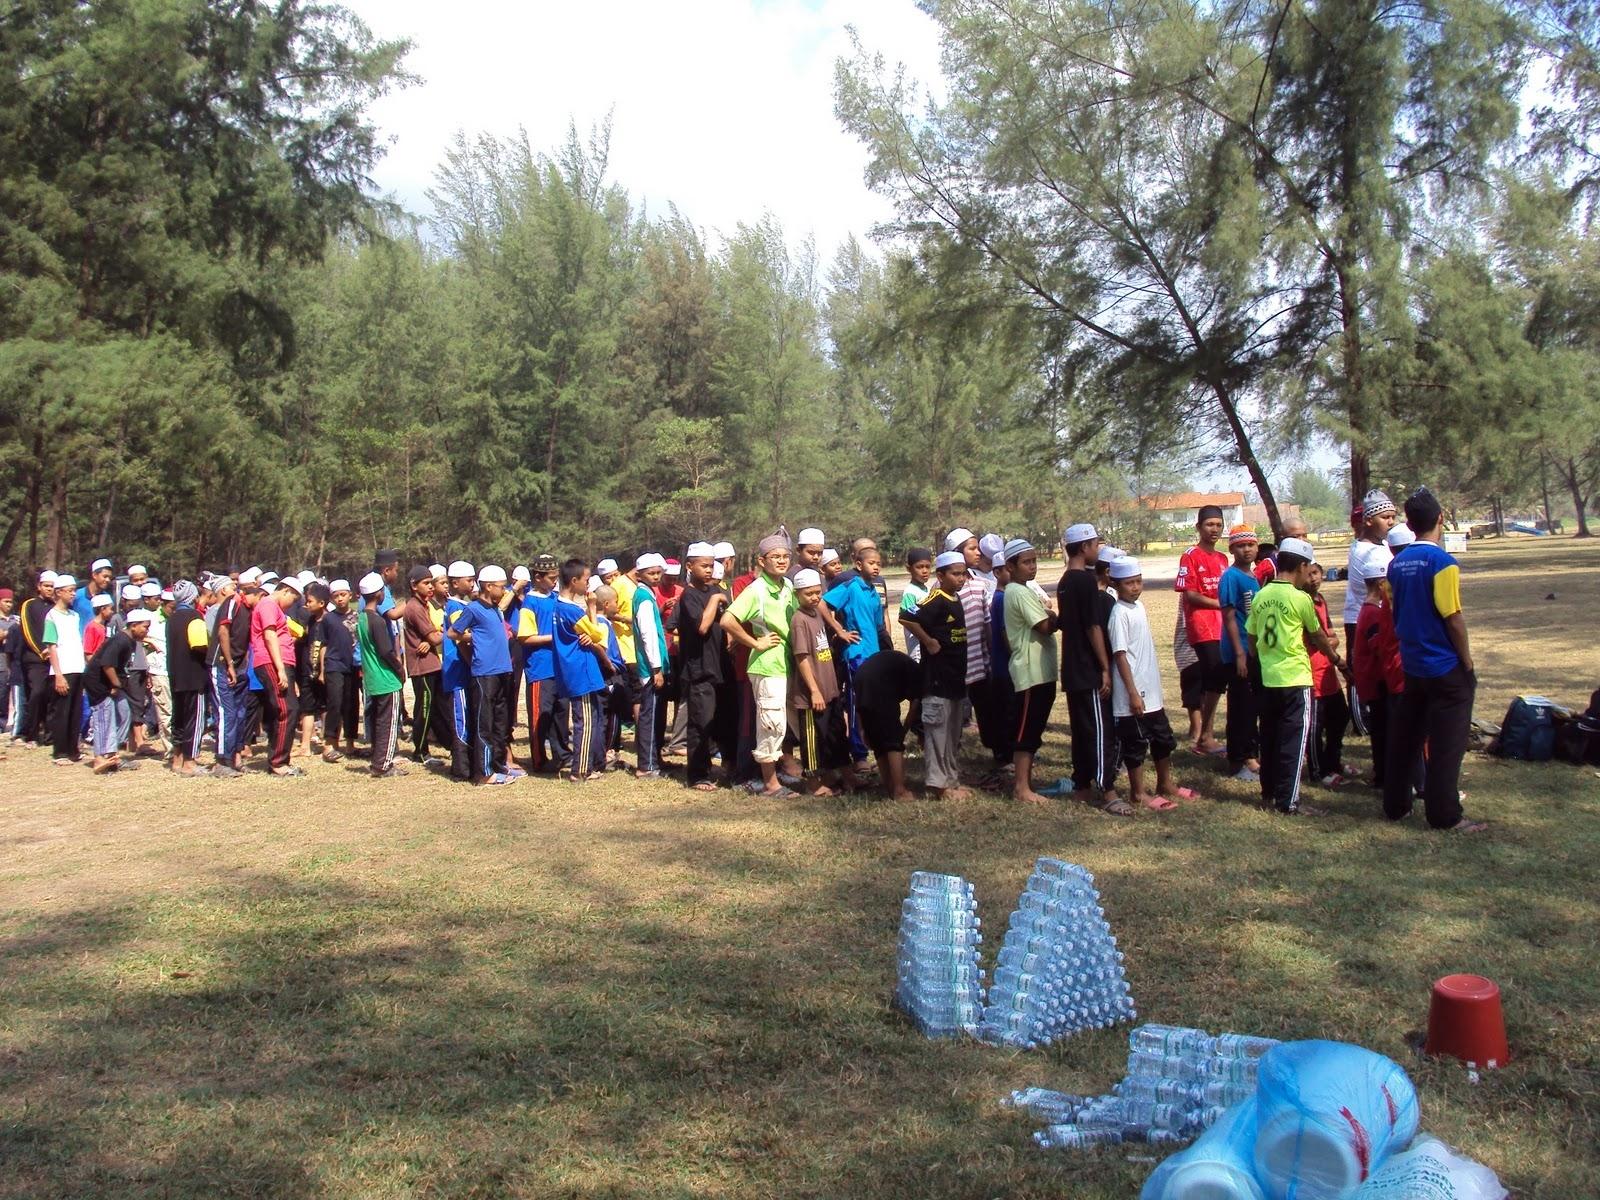 Pantai Rantau Petronas Di Terengganu Tempat Menarik Yang Untuk Kita Kunjungi Of Pantai Rantau Petronas Di Terengganu Tempat Menarik Yang Awesome Untuk Tenangkan Minda